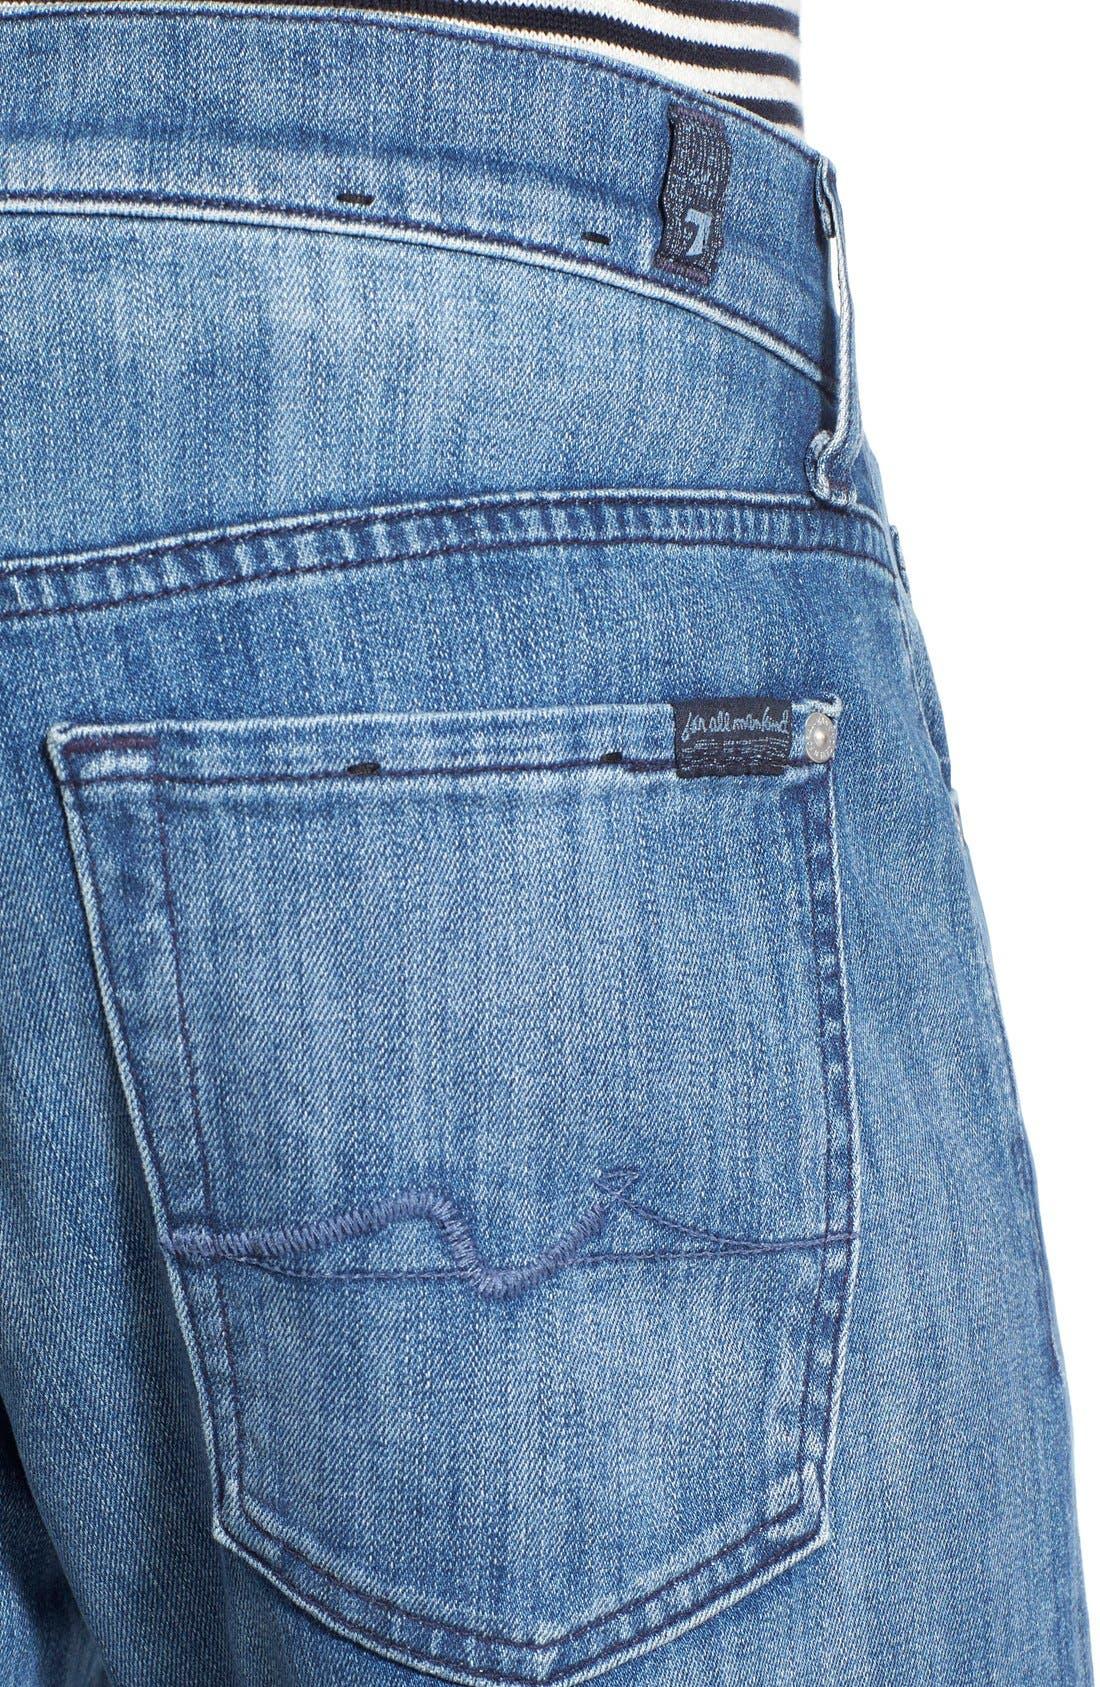 Luxe Performance - Austyn Relaxed Straight Leg Jeans,                             Alternate thumbnail 4, color,                             NAKKITTA BLUE